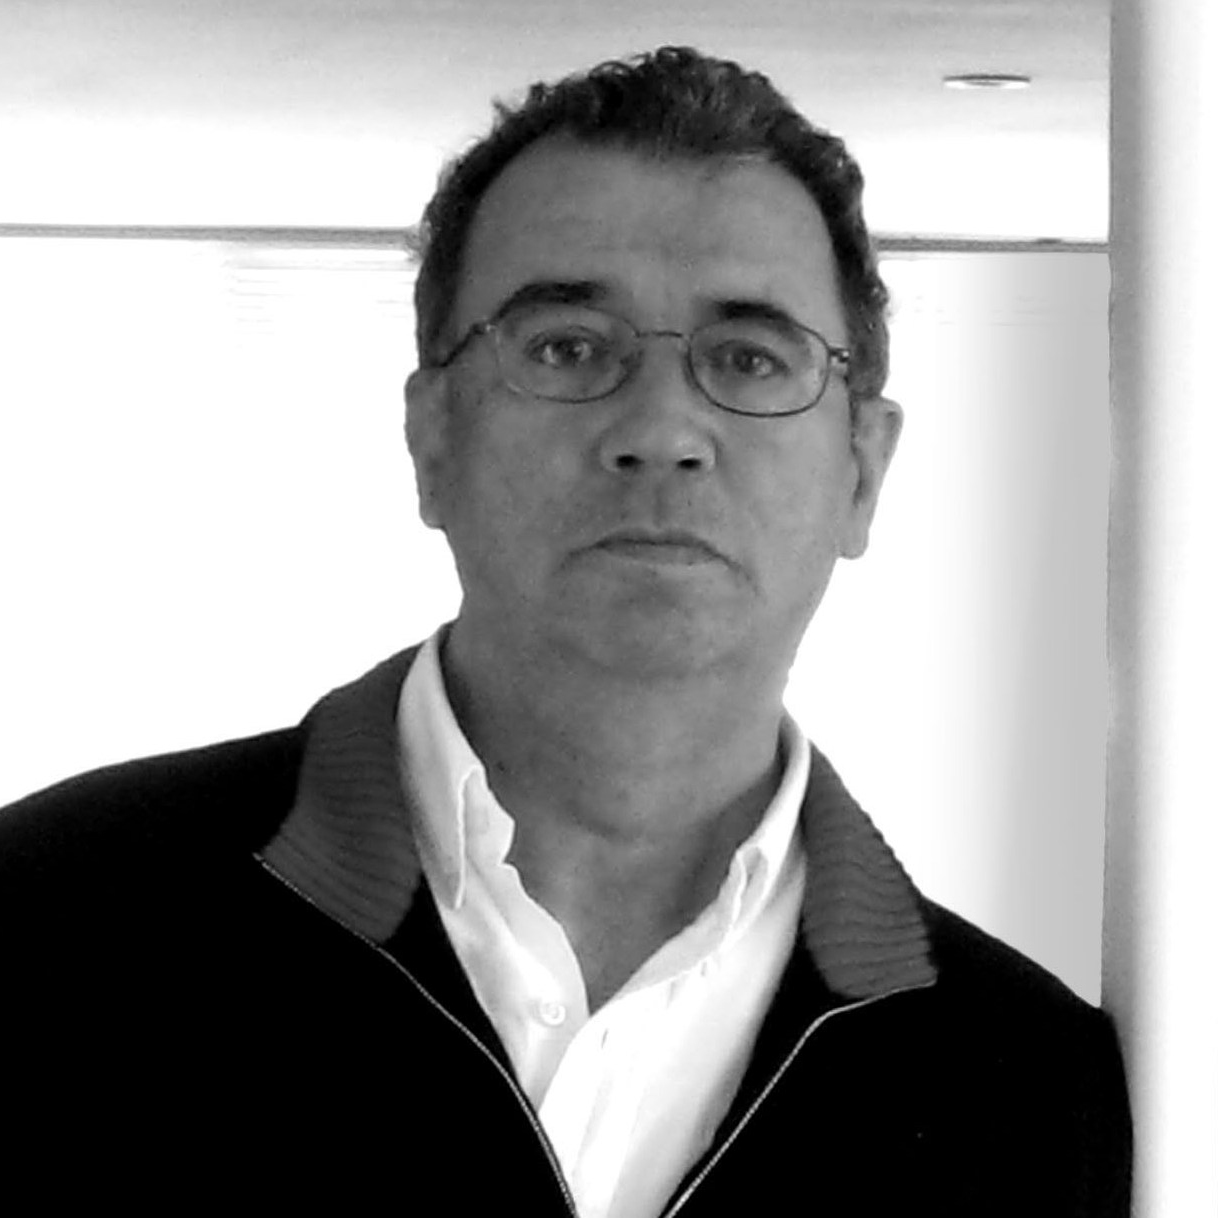 Darío Jaramillo Agudelo